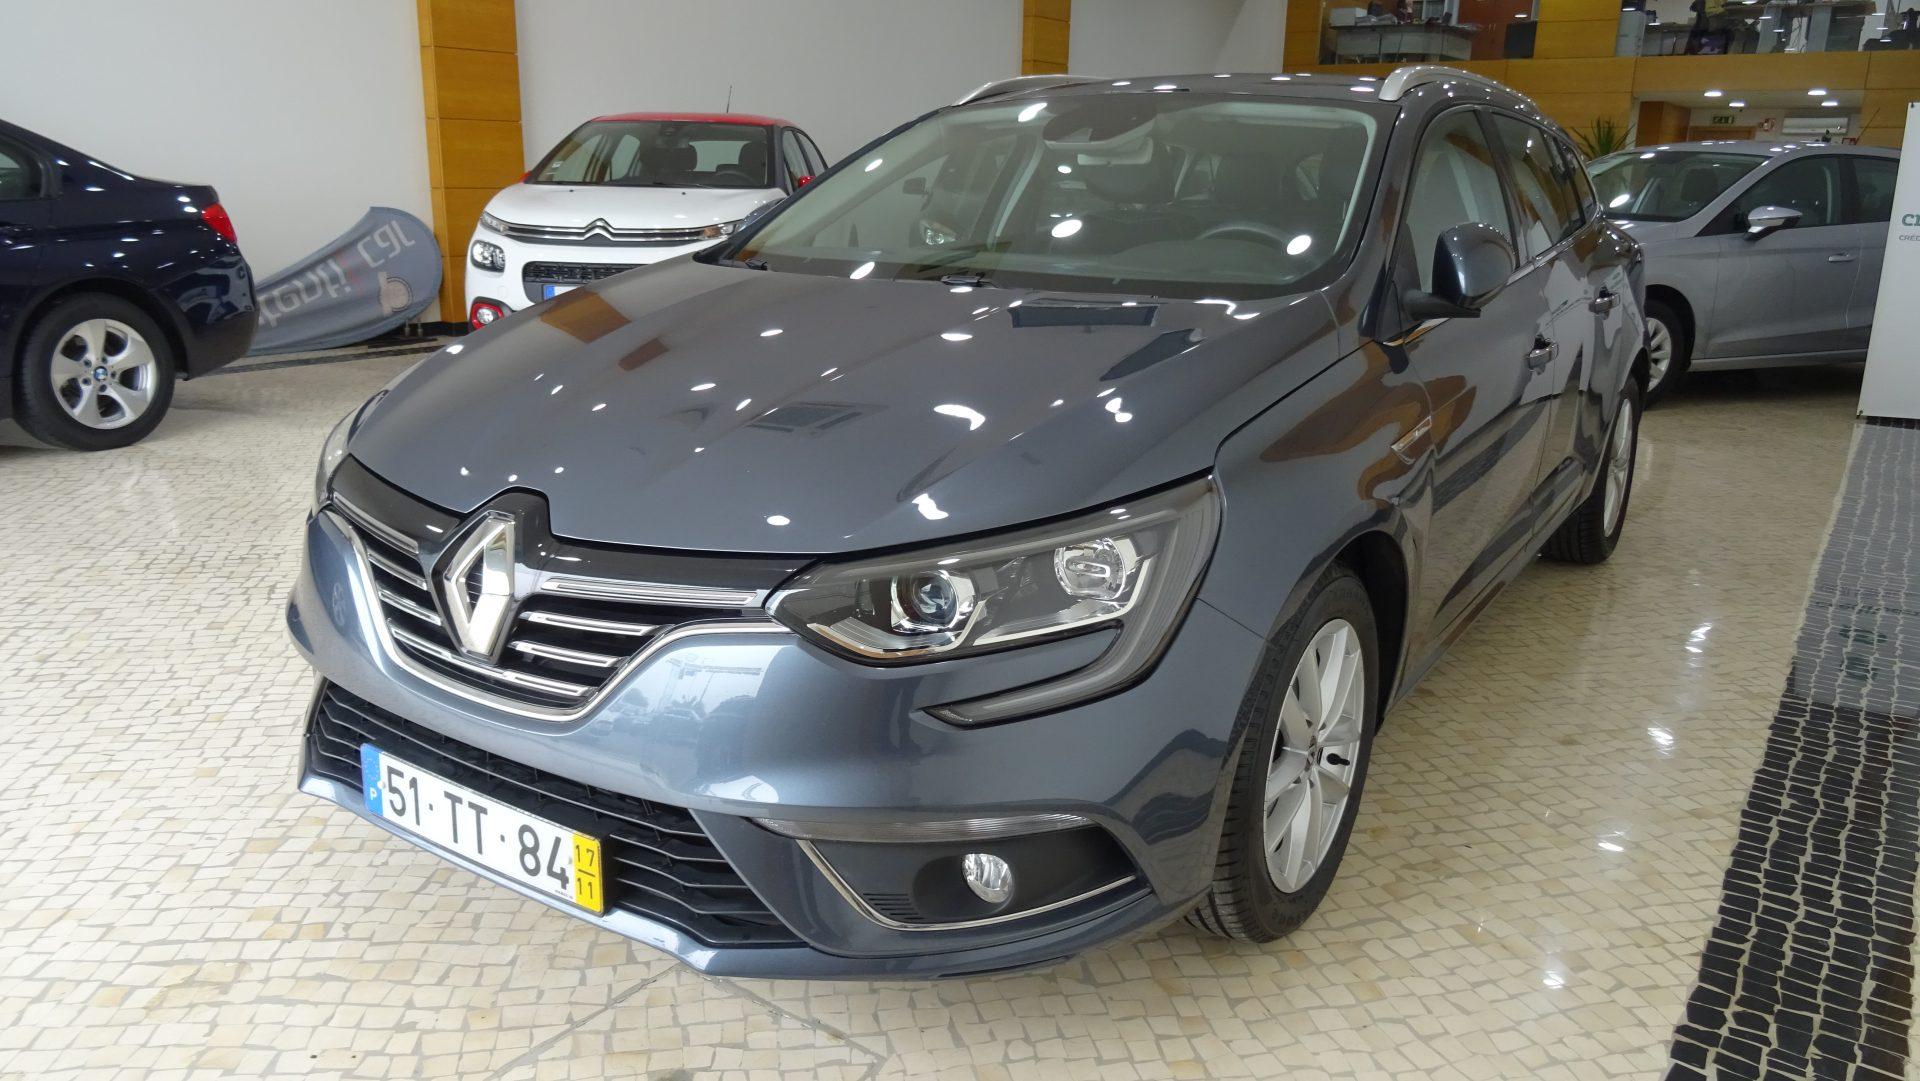 Renault Megane 1.5 DCi Sport Tourer Intense